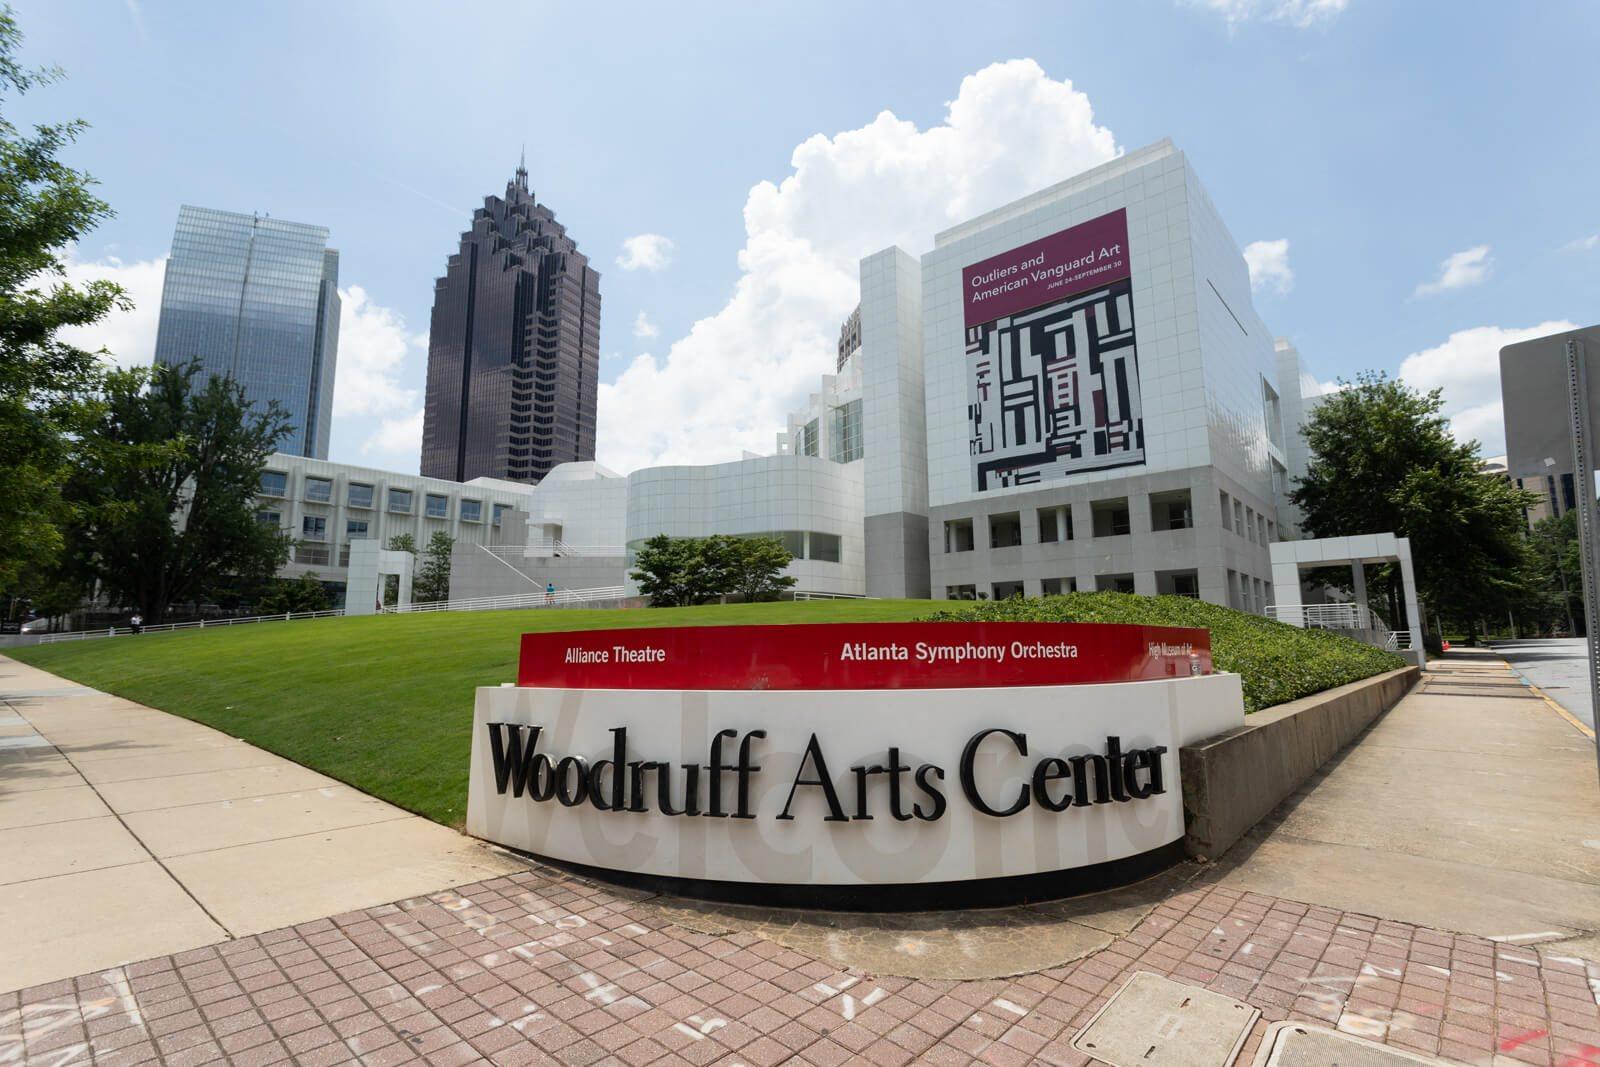 Close to Woodruff Arts Center at Windsor at Midtown, 222 14th Street NE, Atlanta